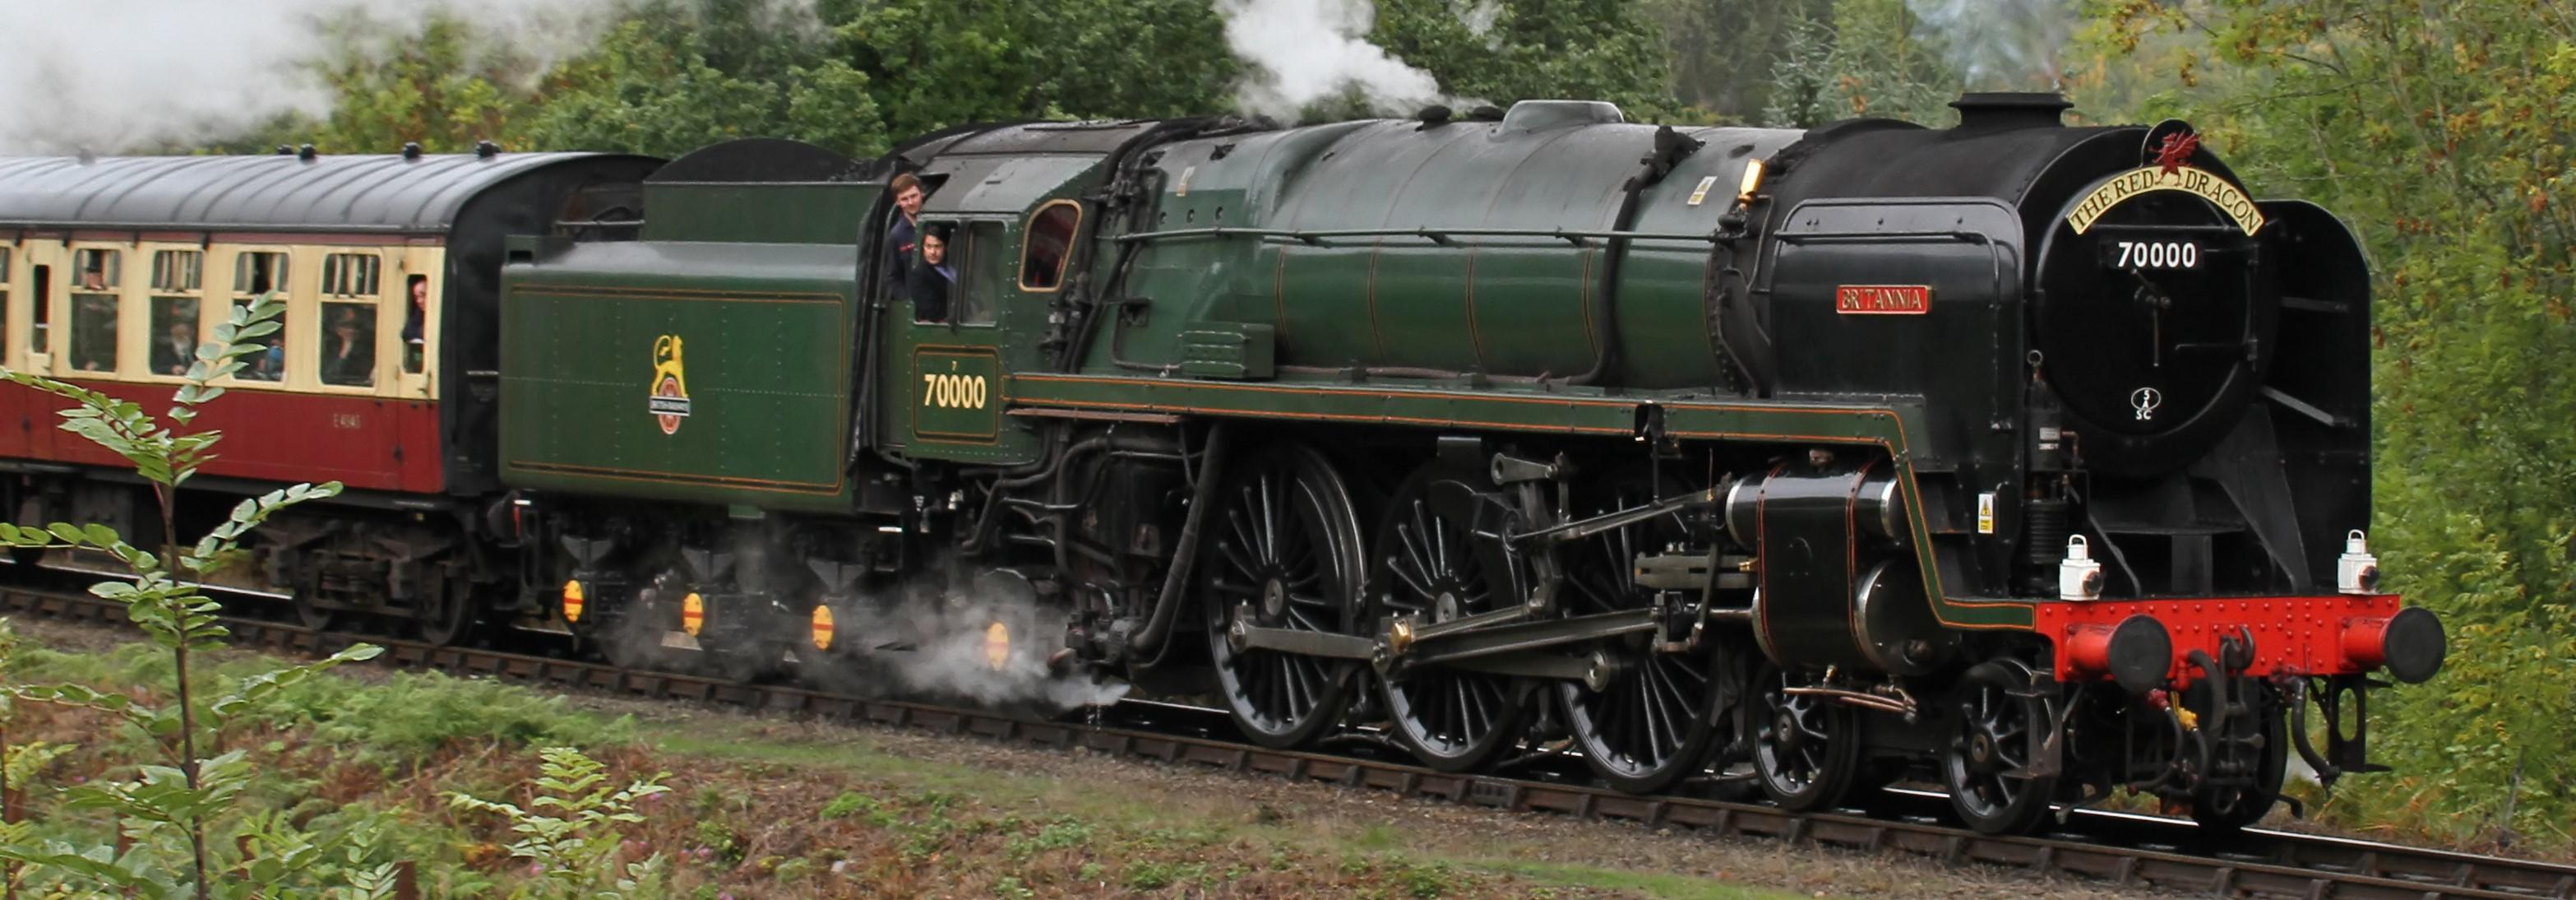 70000 'Britannia' at Highley in September 2018. ©Tony Hisgett